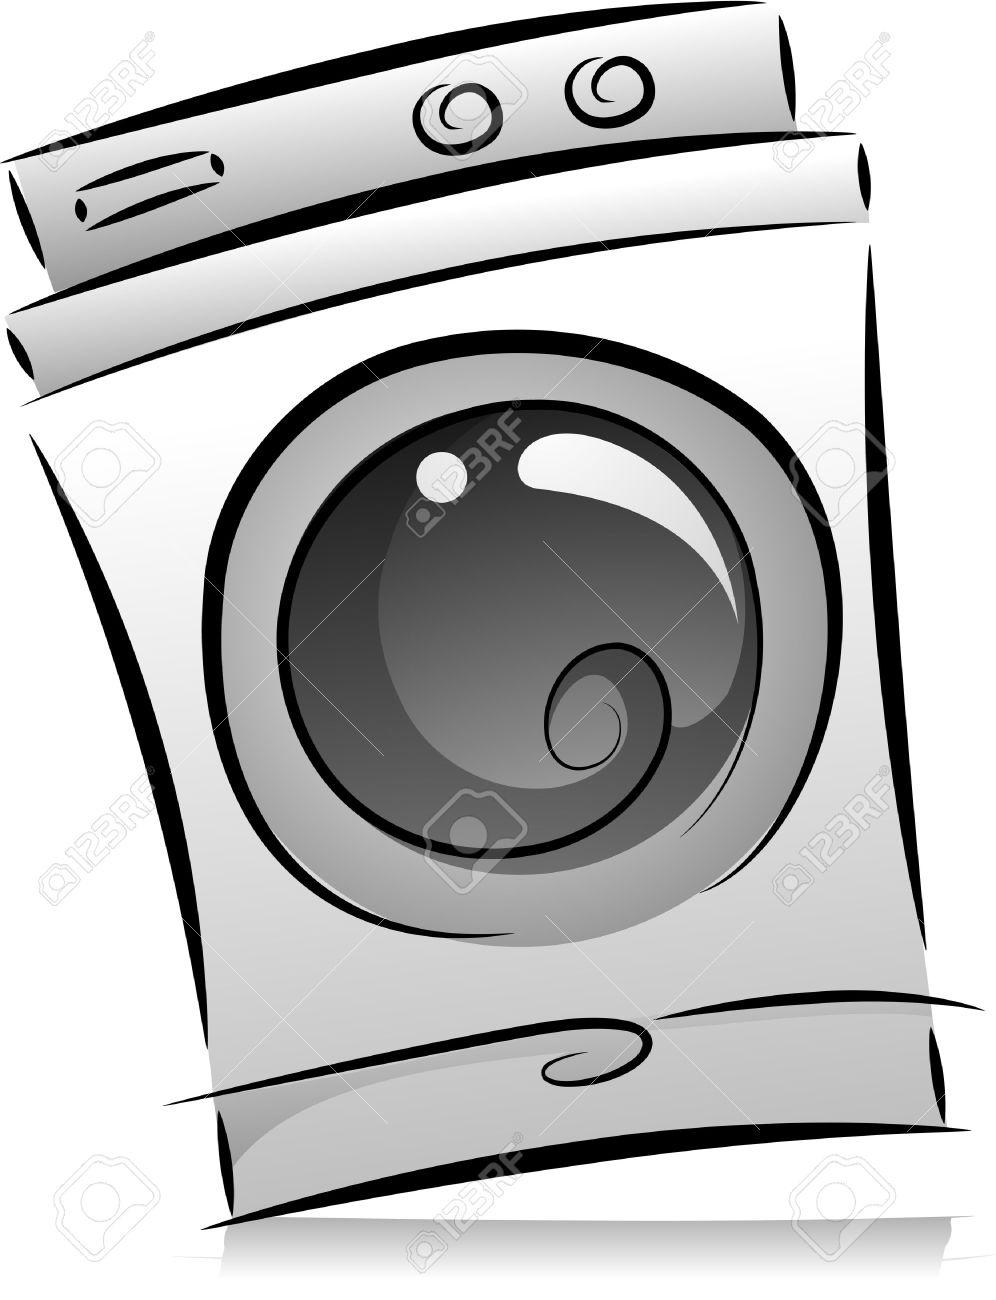 Illustration Of Washing Machine In Black And White Stock Photo.